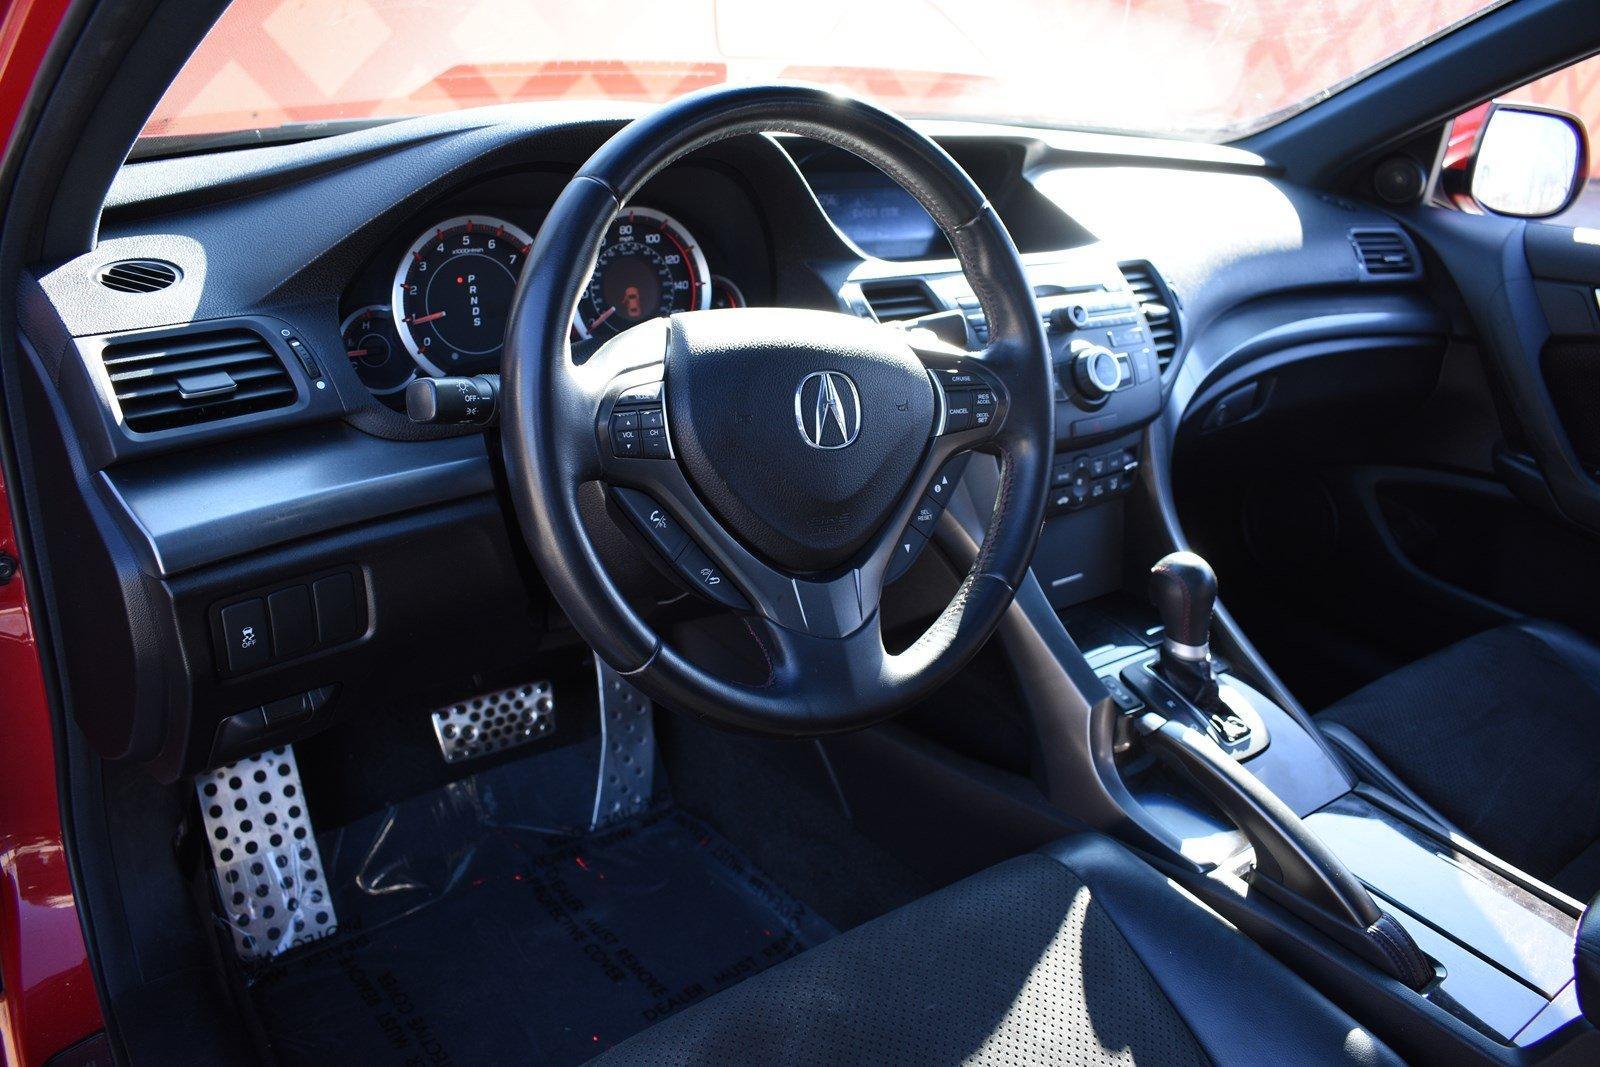 2012 Acura Tsx Special Edition Stock 016257 For Sale Near Sandy Springs Ga Ga Acura Dealer